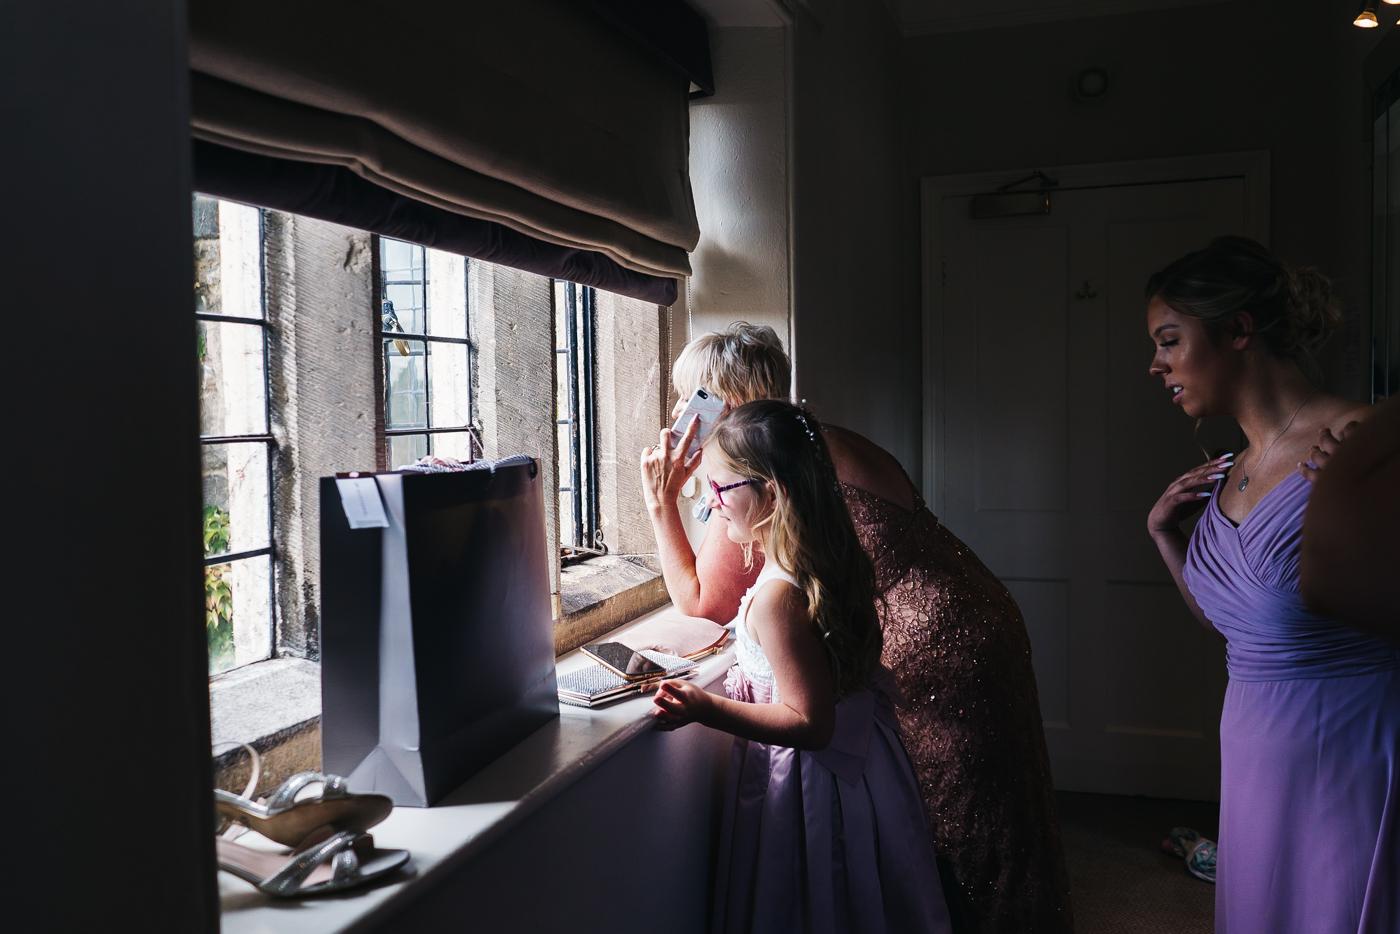 headlame-hall-north-yorkshire-north-east-photographer-wedding-0010.jpg